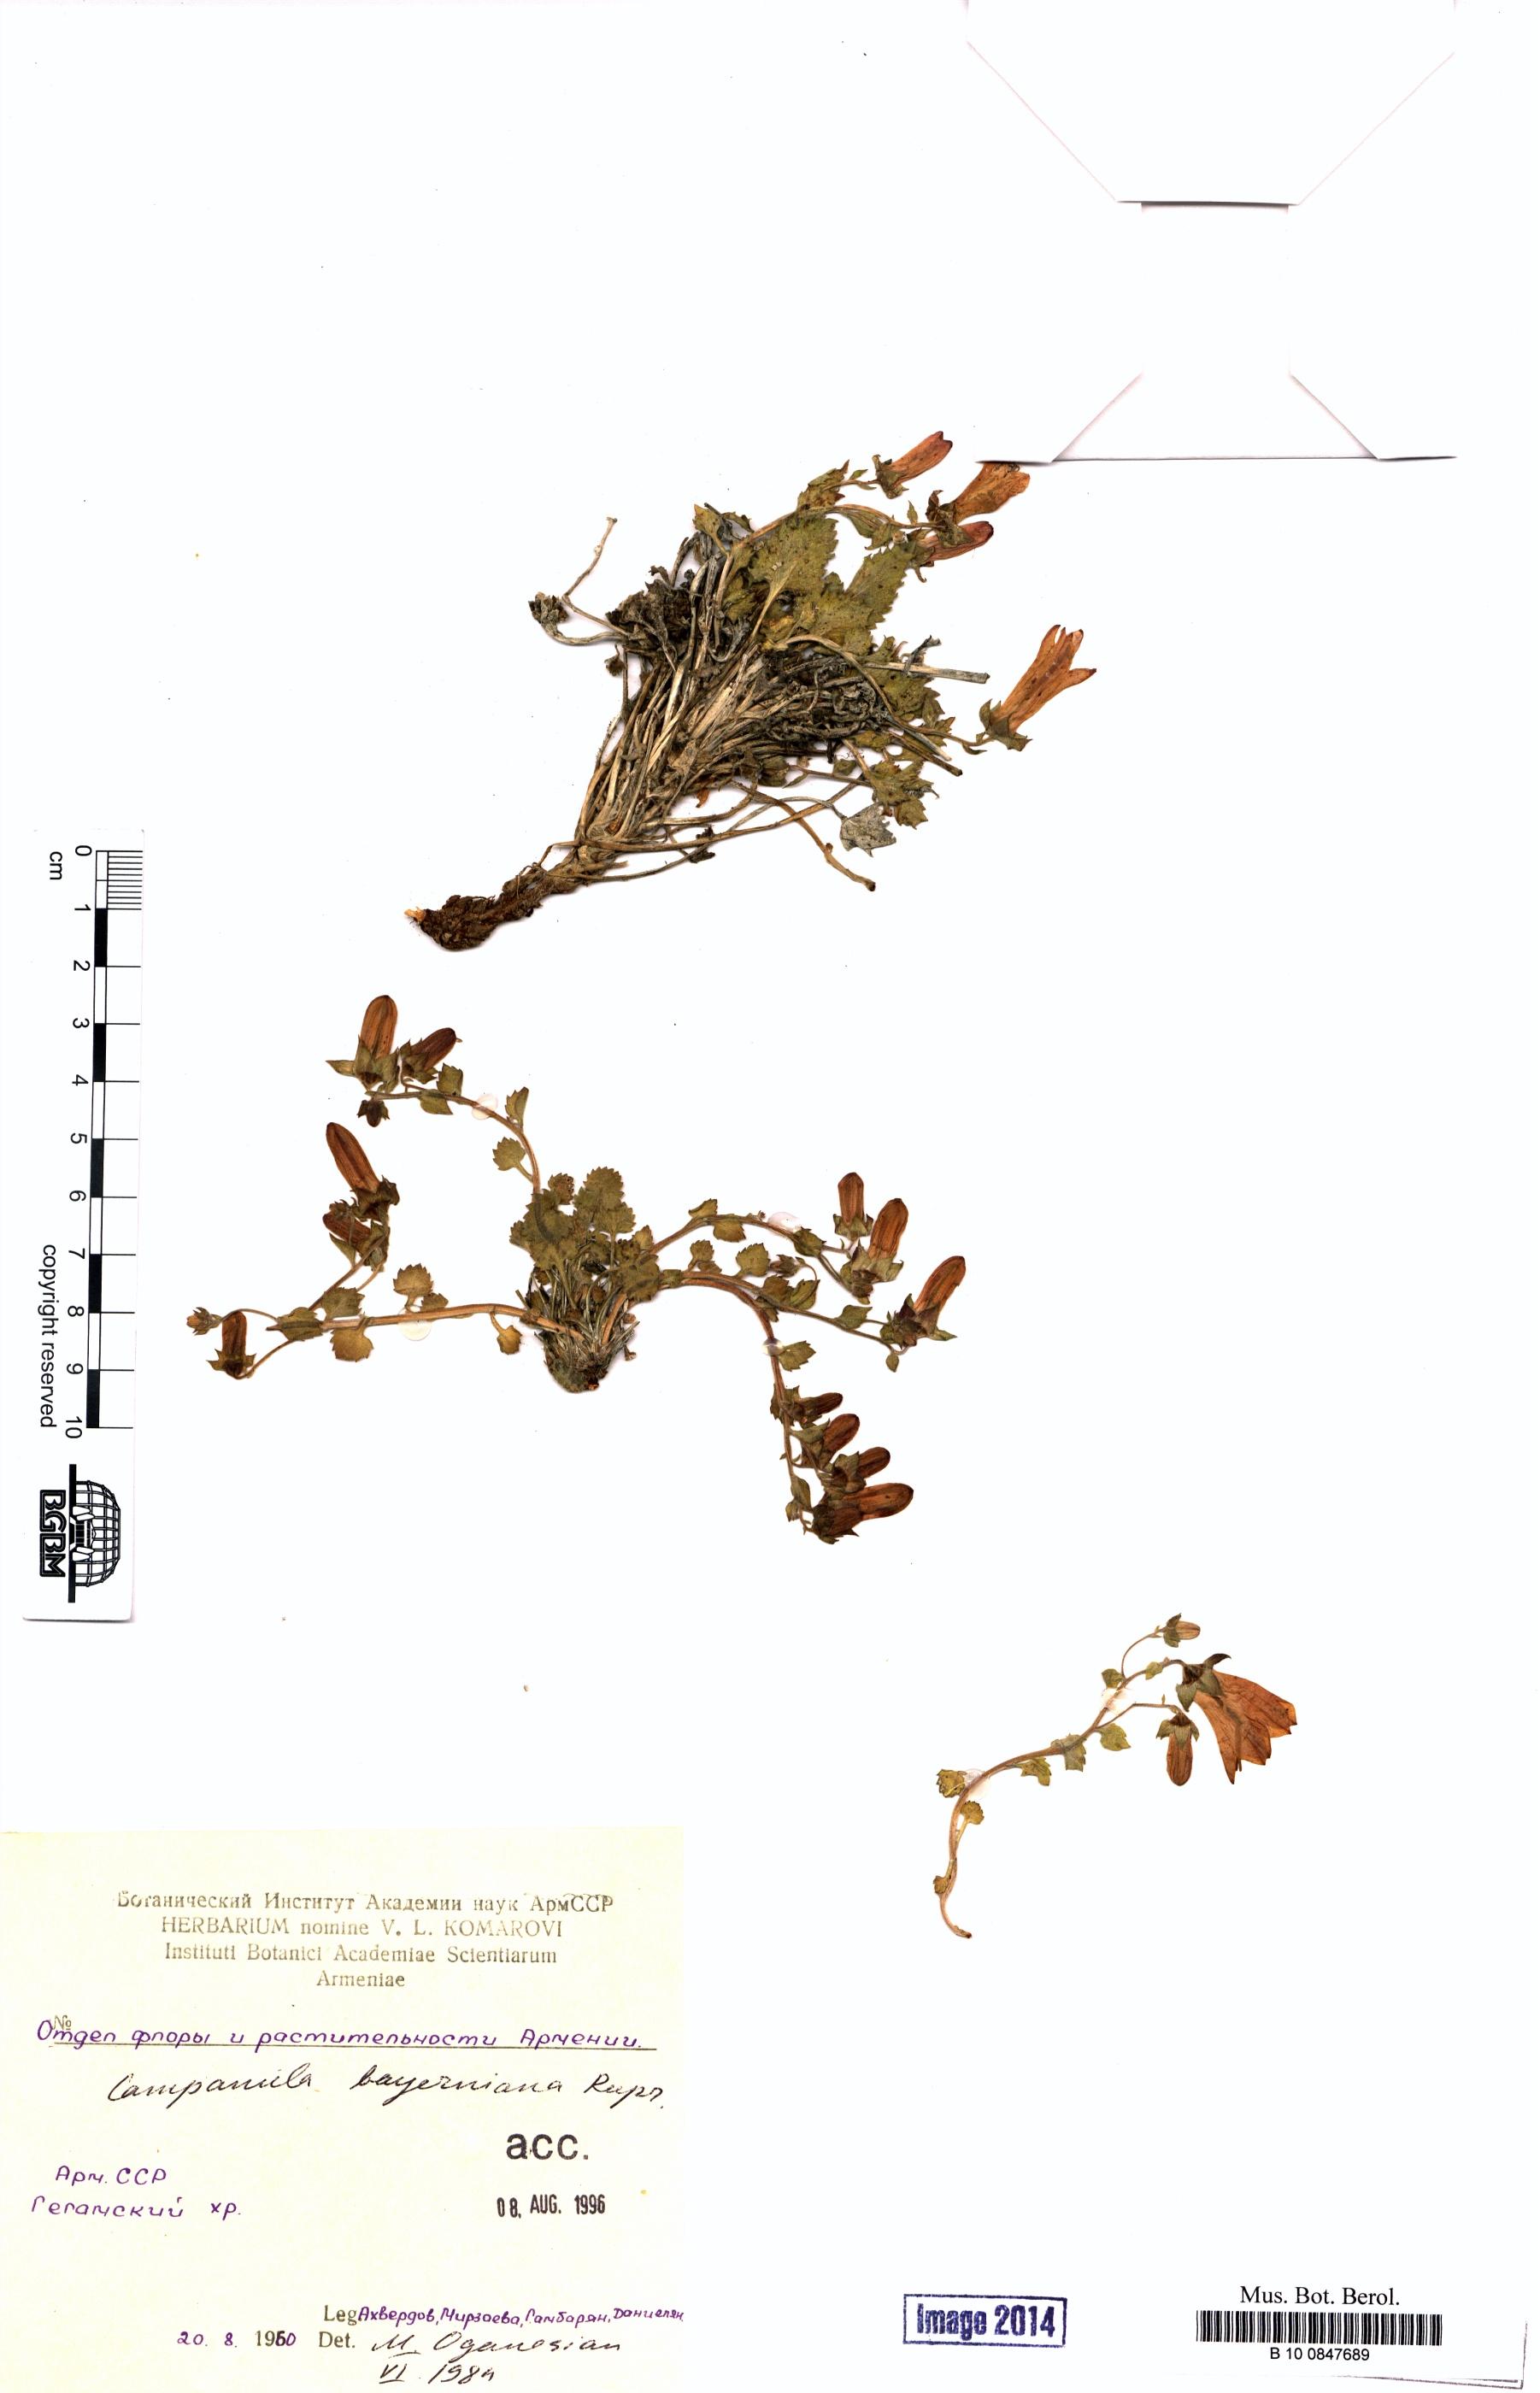 http://ww2.bgbm.org/herbarium/images/B/10/08/47/68/B_10_0847689.jpg